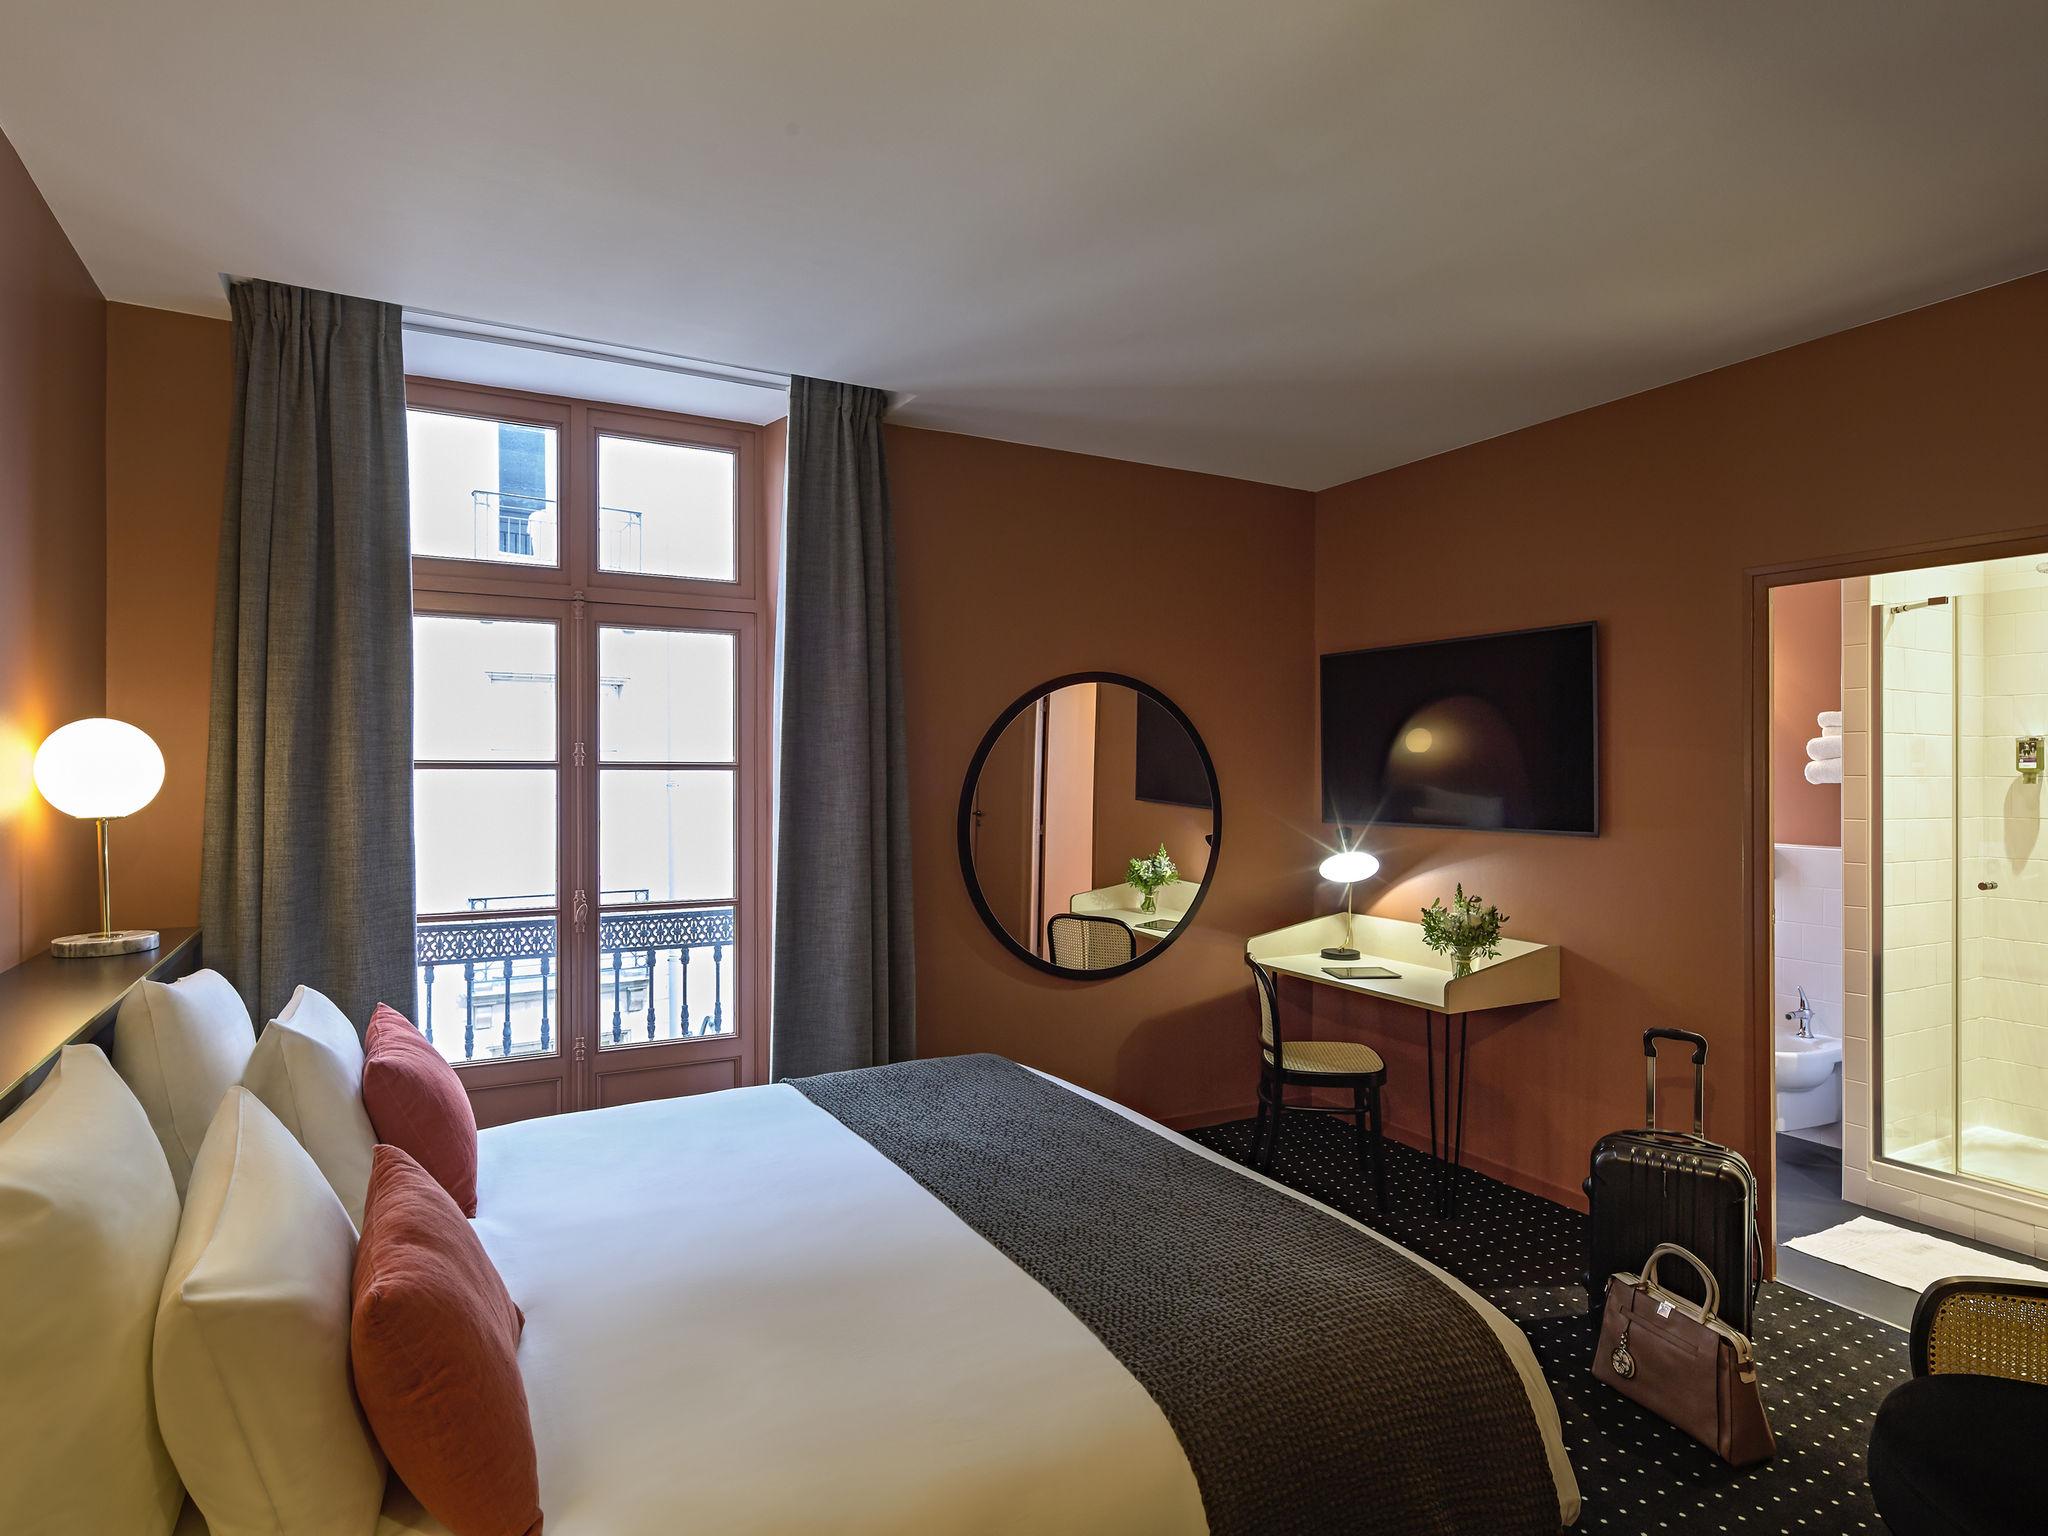 Hotel - Hotel Nantes Centre Passage Pommeraye